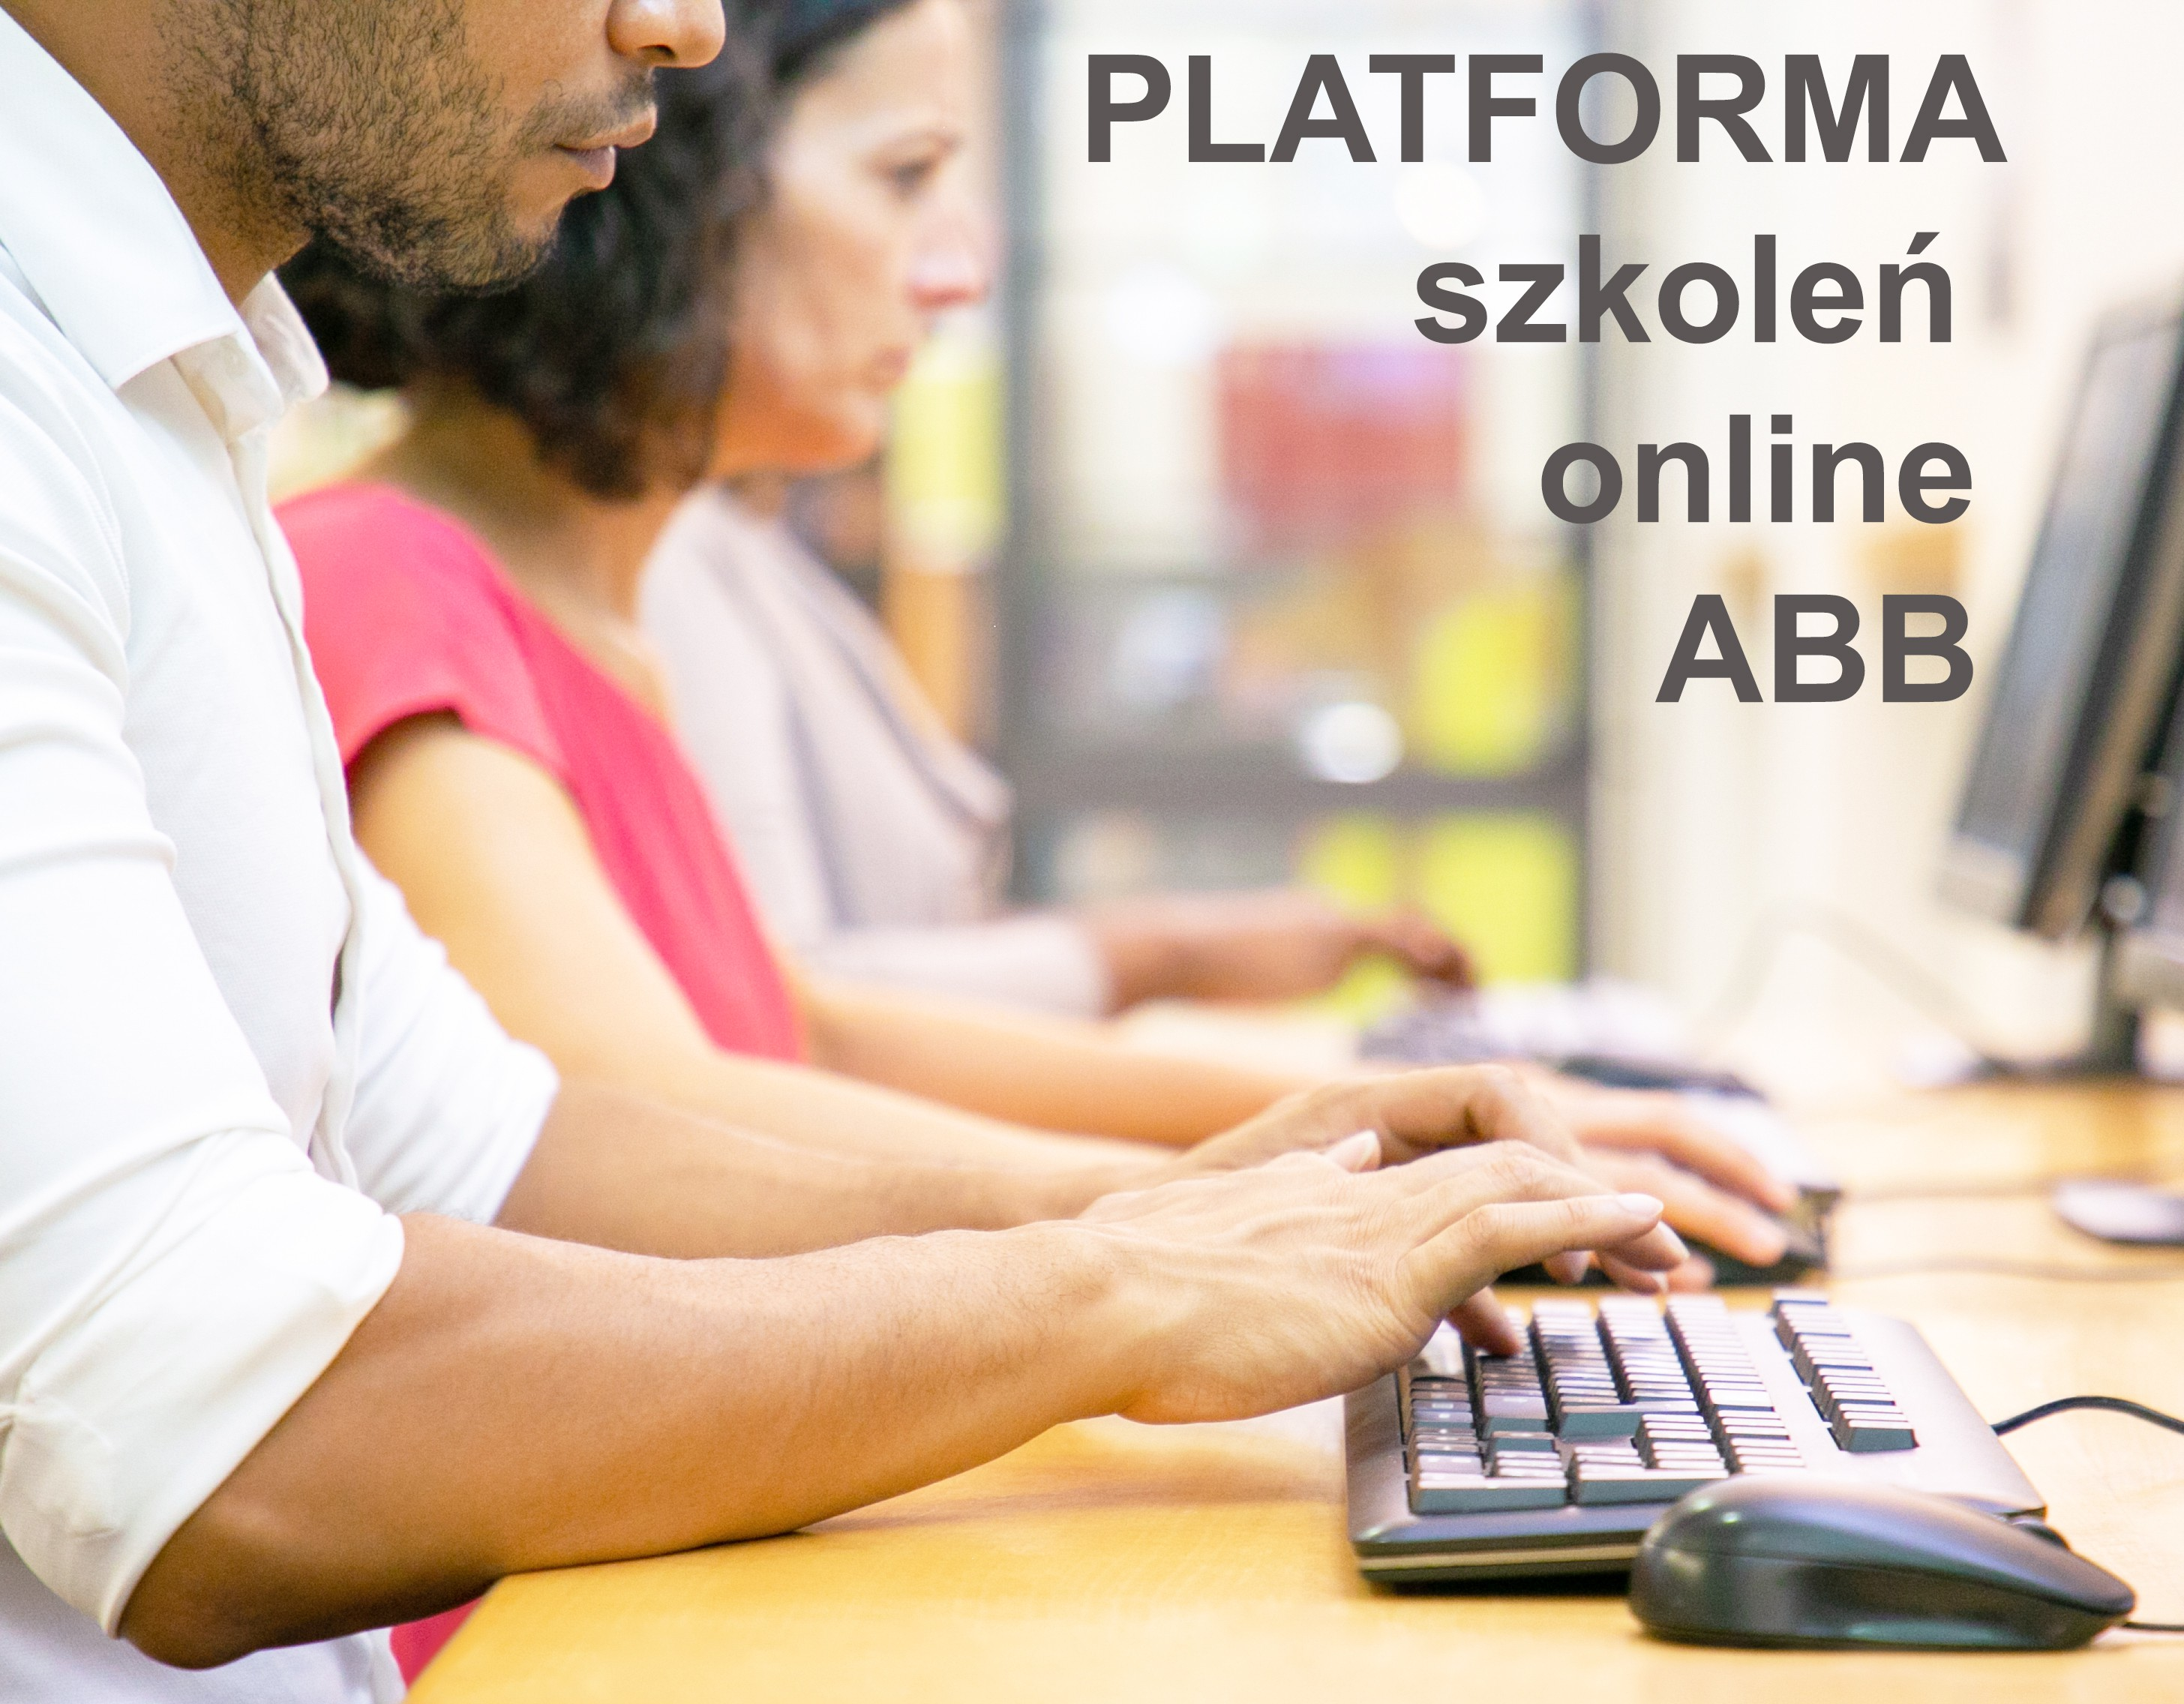 Platforma szkoleń on-line ABB